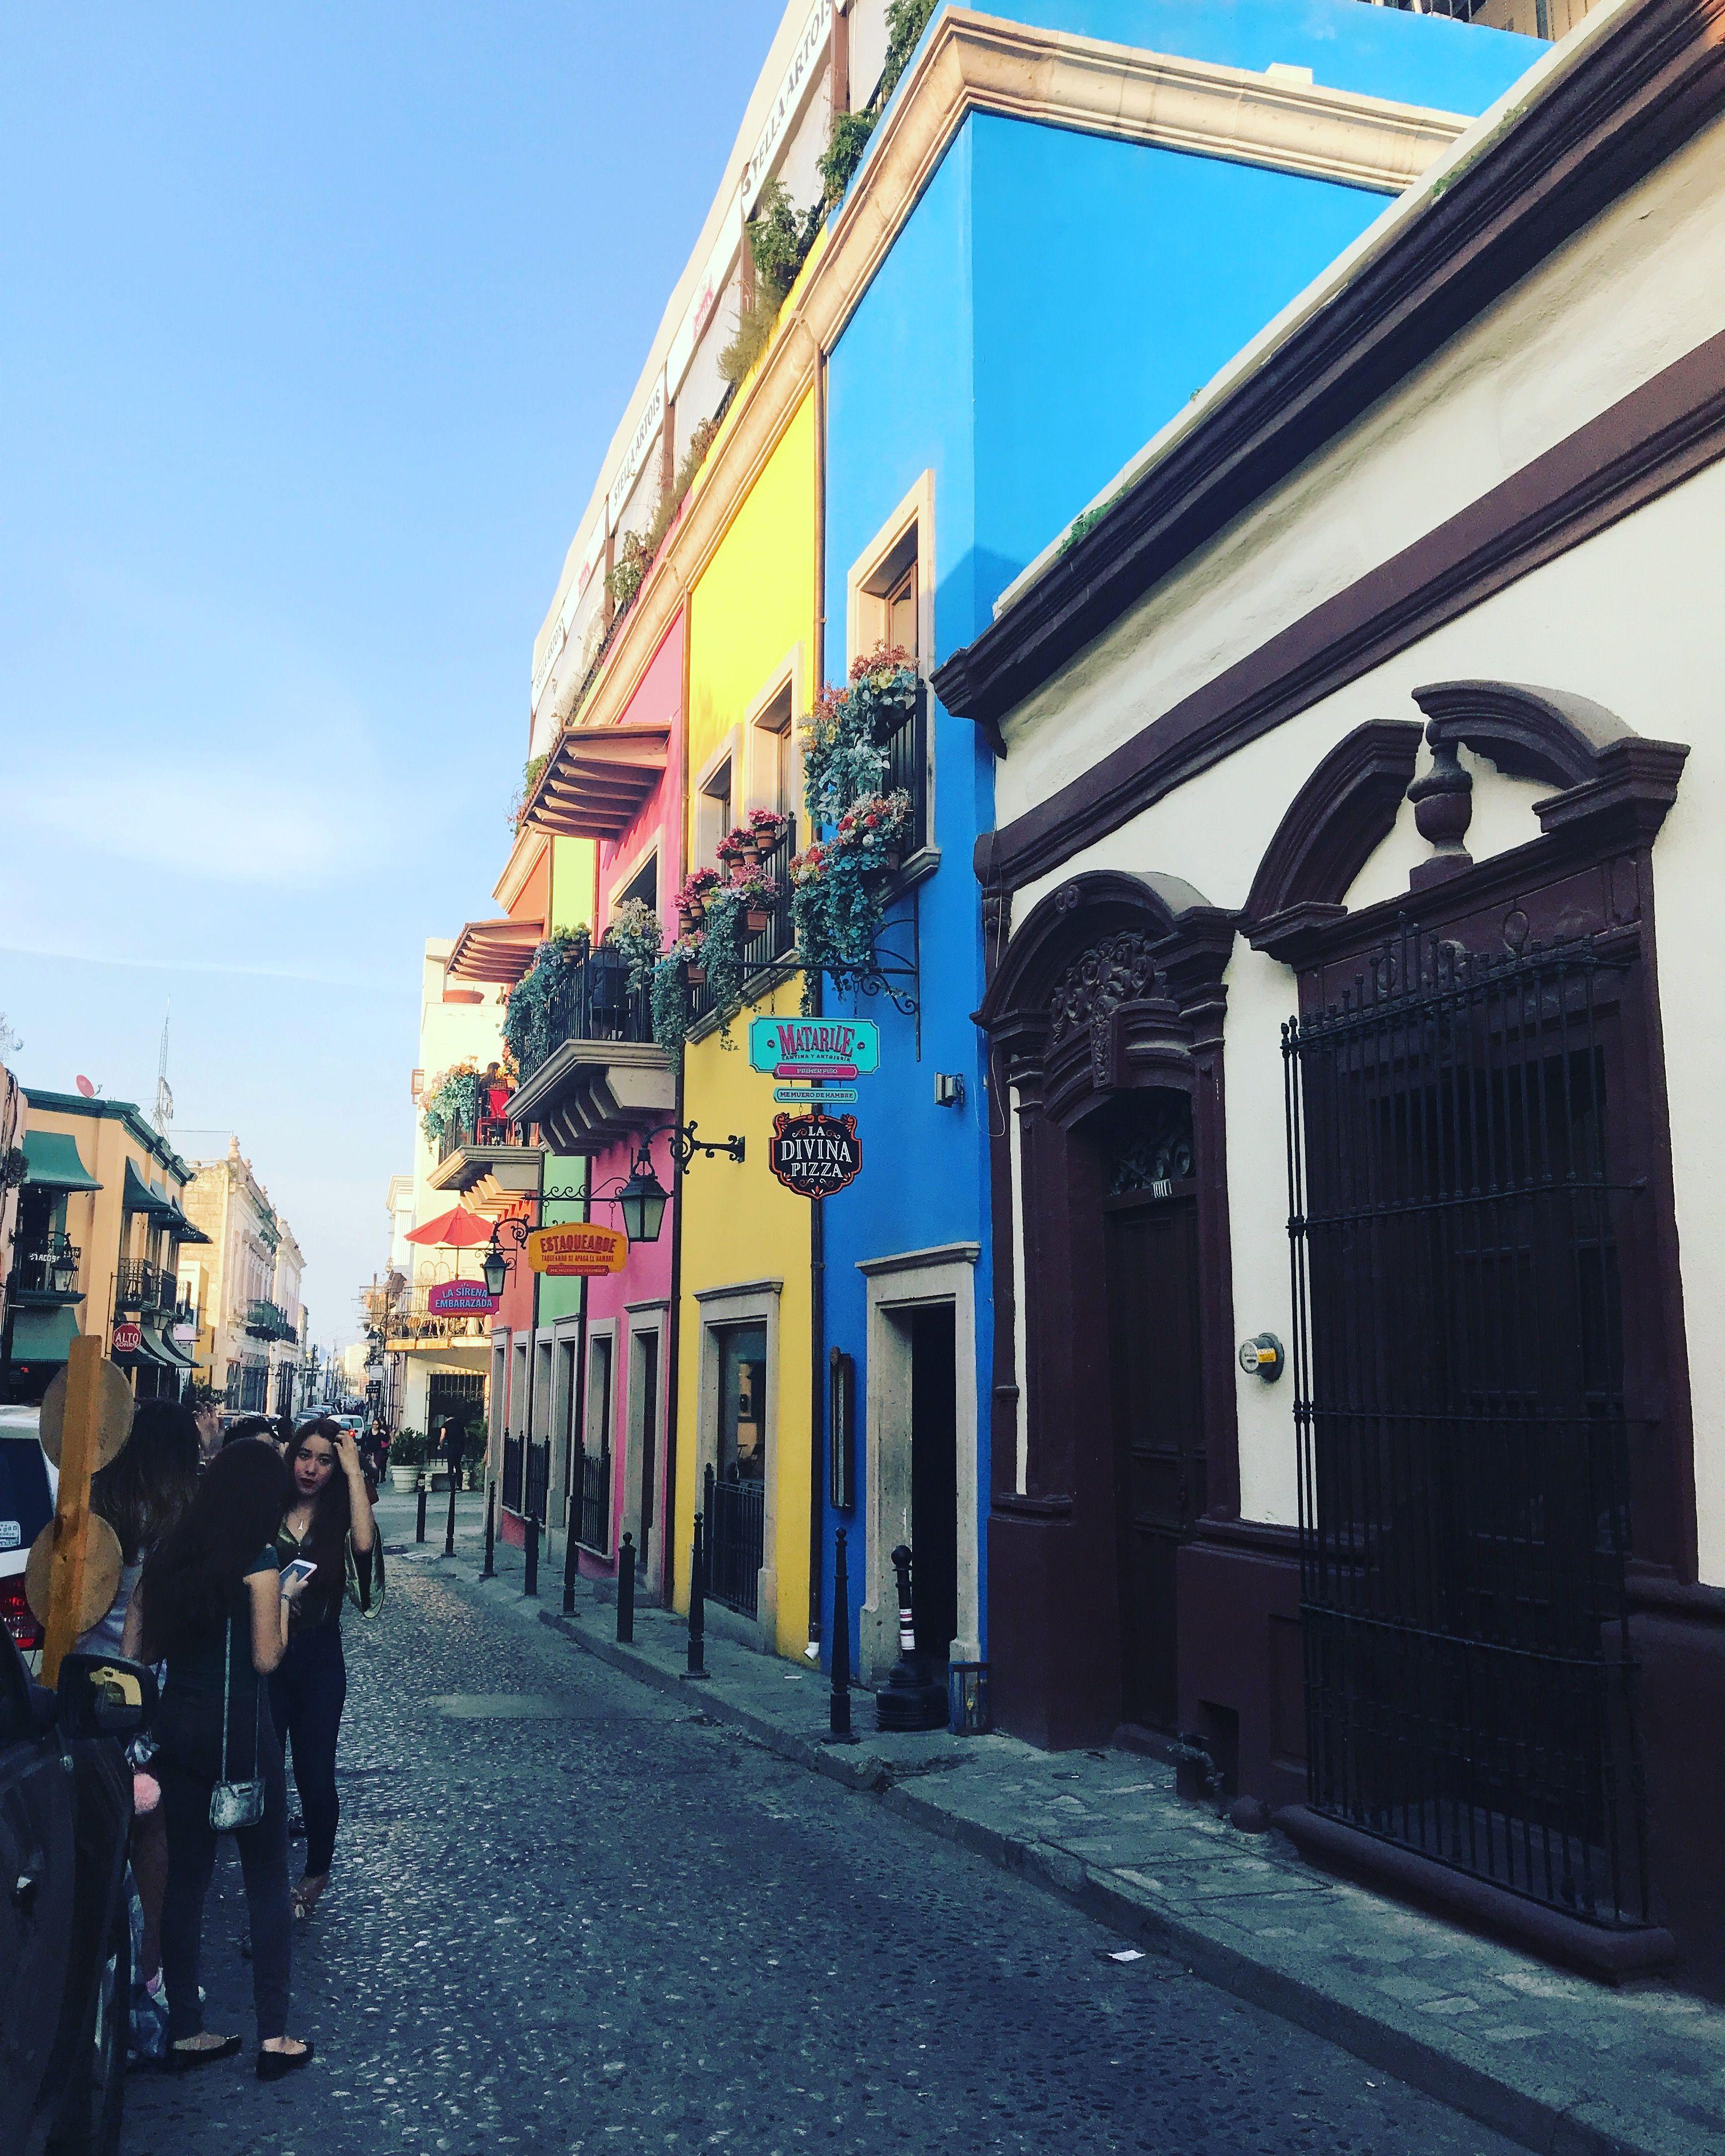 Barrio Antiguo Monterrey Mxico Restaurantes Me muero